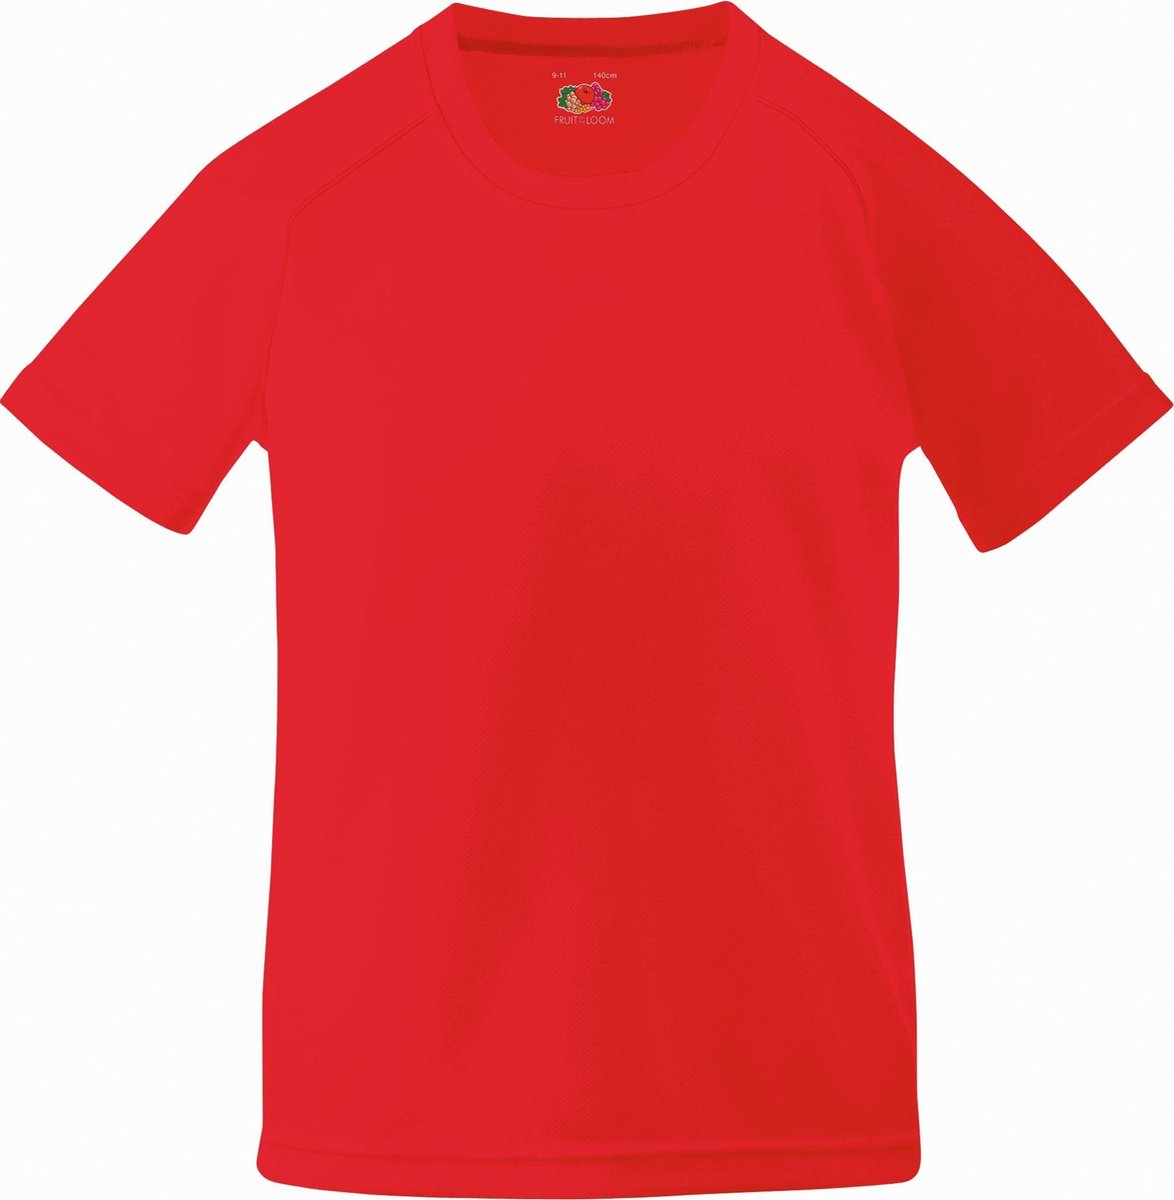 Fruit Of The Loom Kinder Unisex Performance Sportskleding T-shirt (Rood)